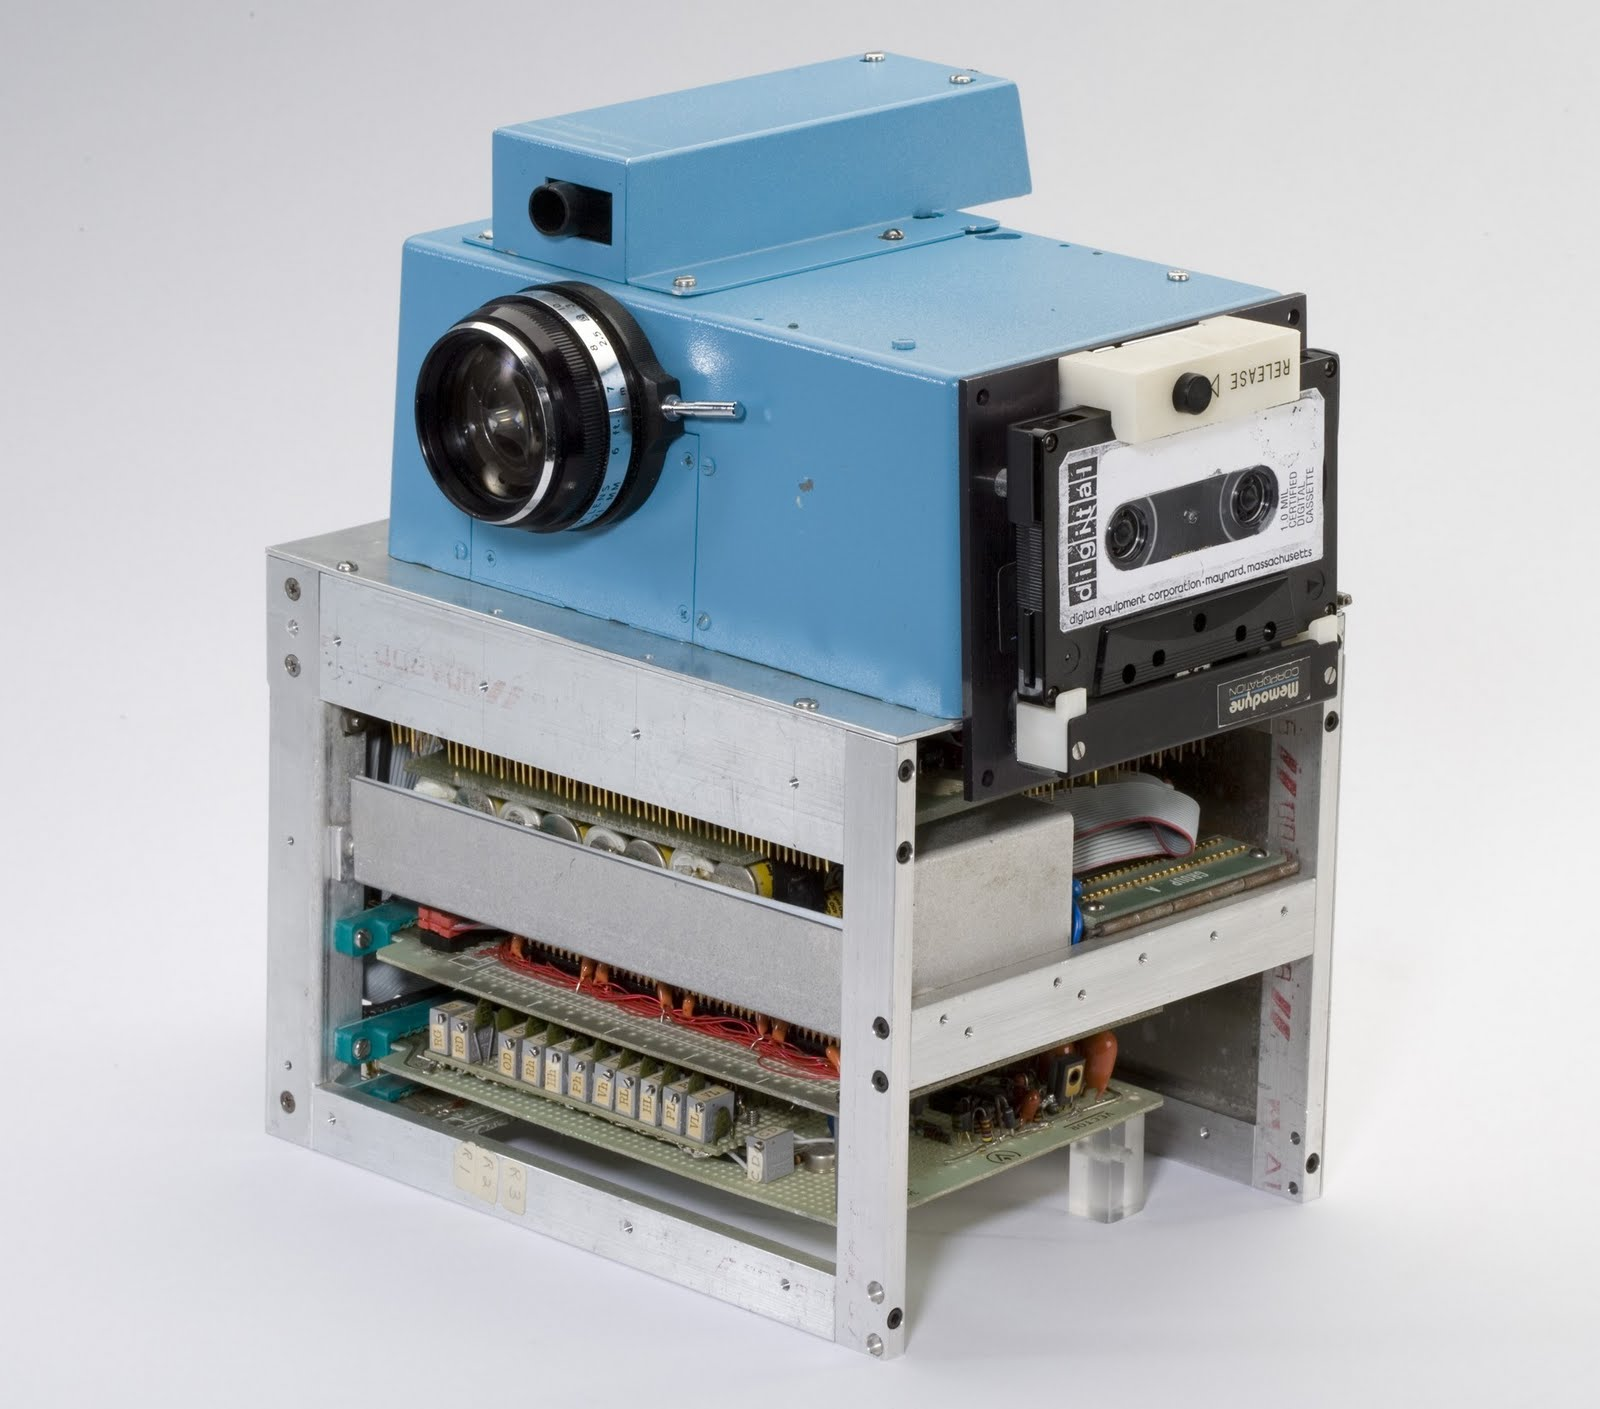 1_Camera